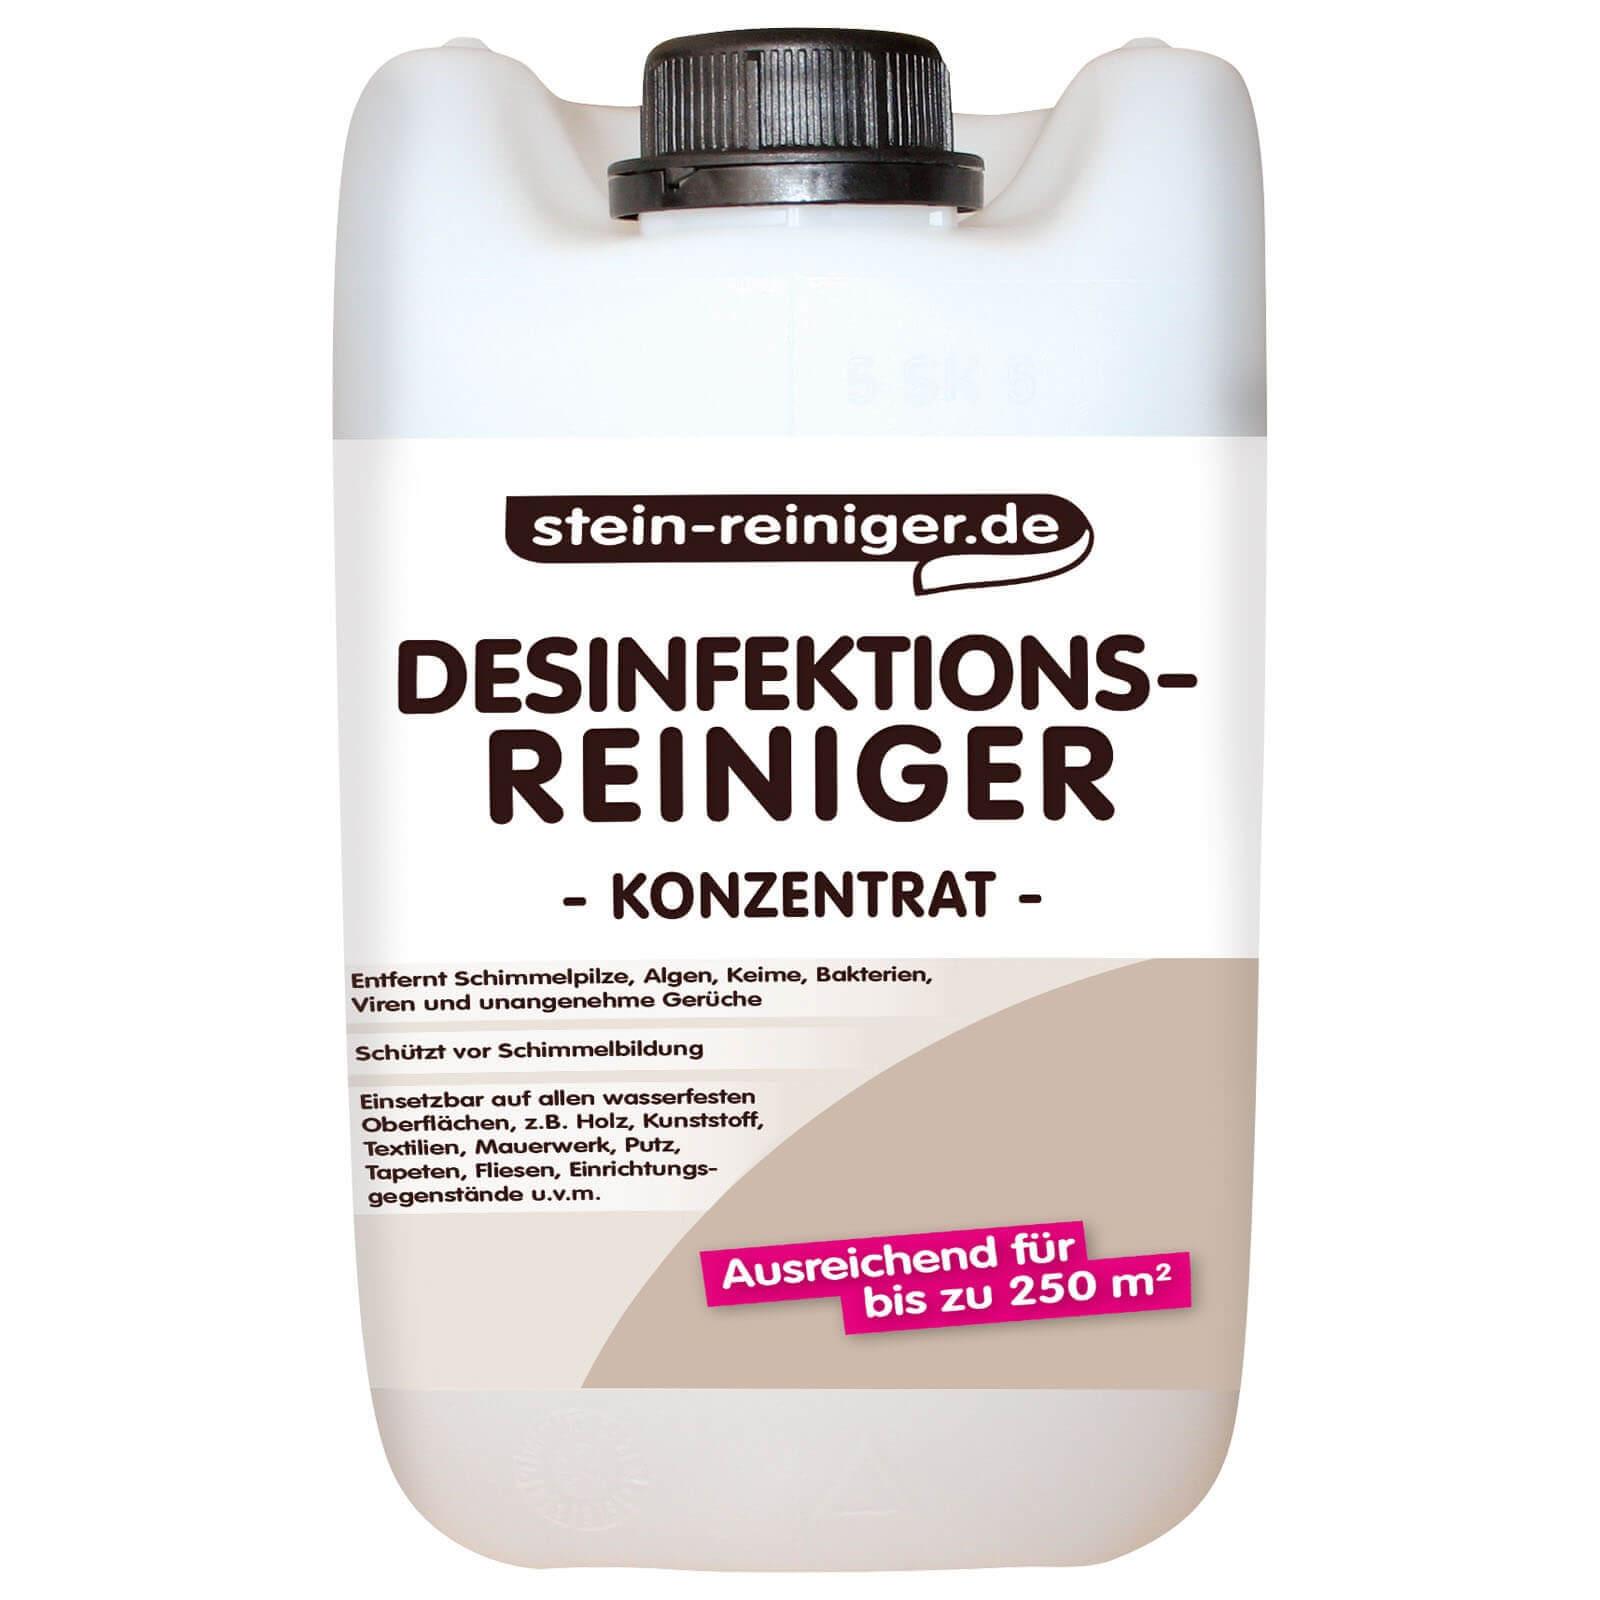 stein-reiniger.de: Desinfektions-Reiniger Reini...